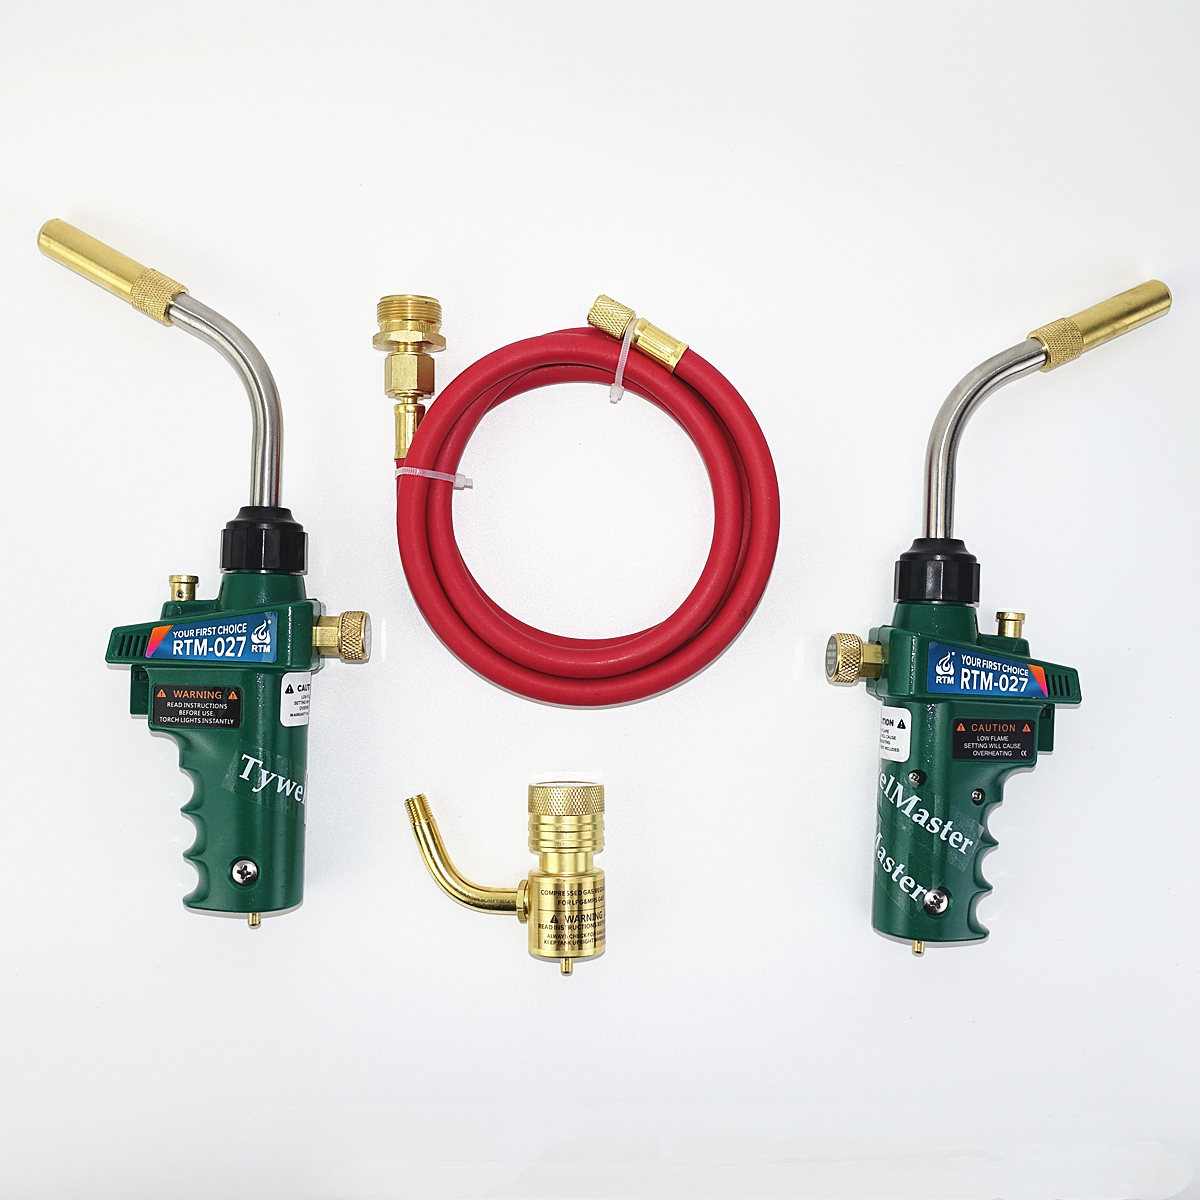 Torch 5m 1 Quenching CGA600 BBQ Heating Tool Hose Brazing Piezo Professional Plumbing Flame Ignition HVAC Gas Mapp Torch Welding